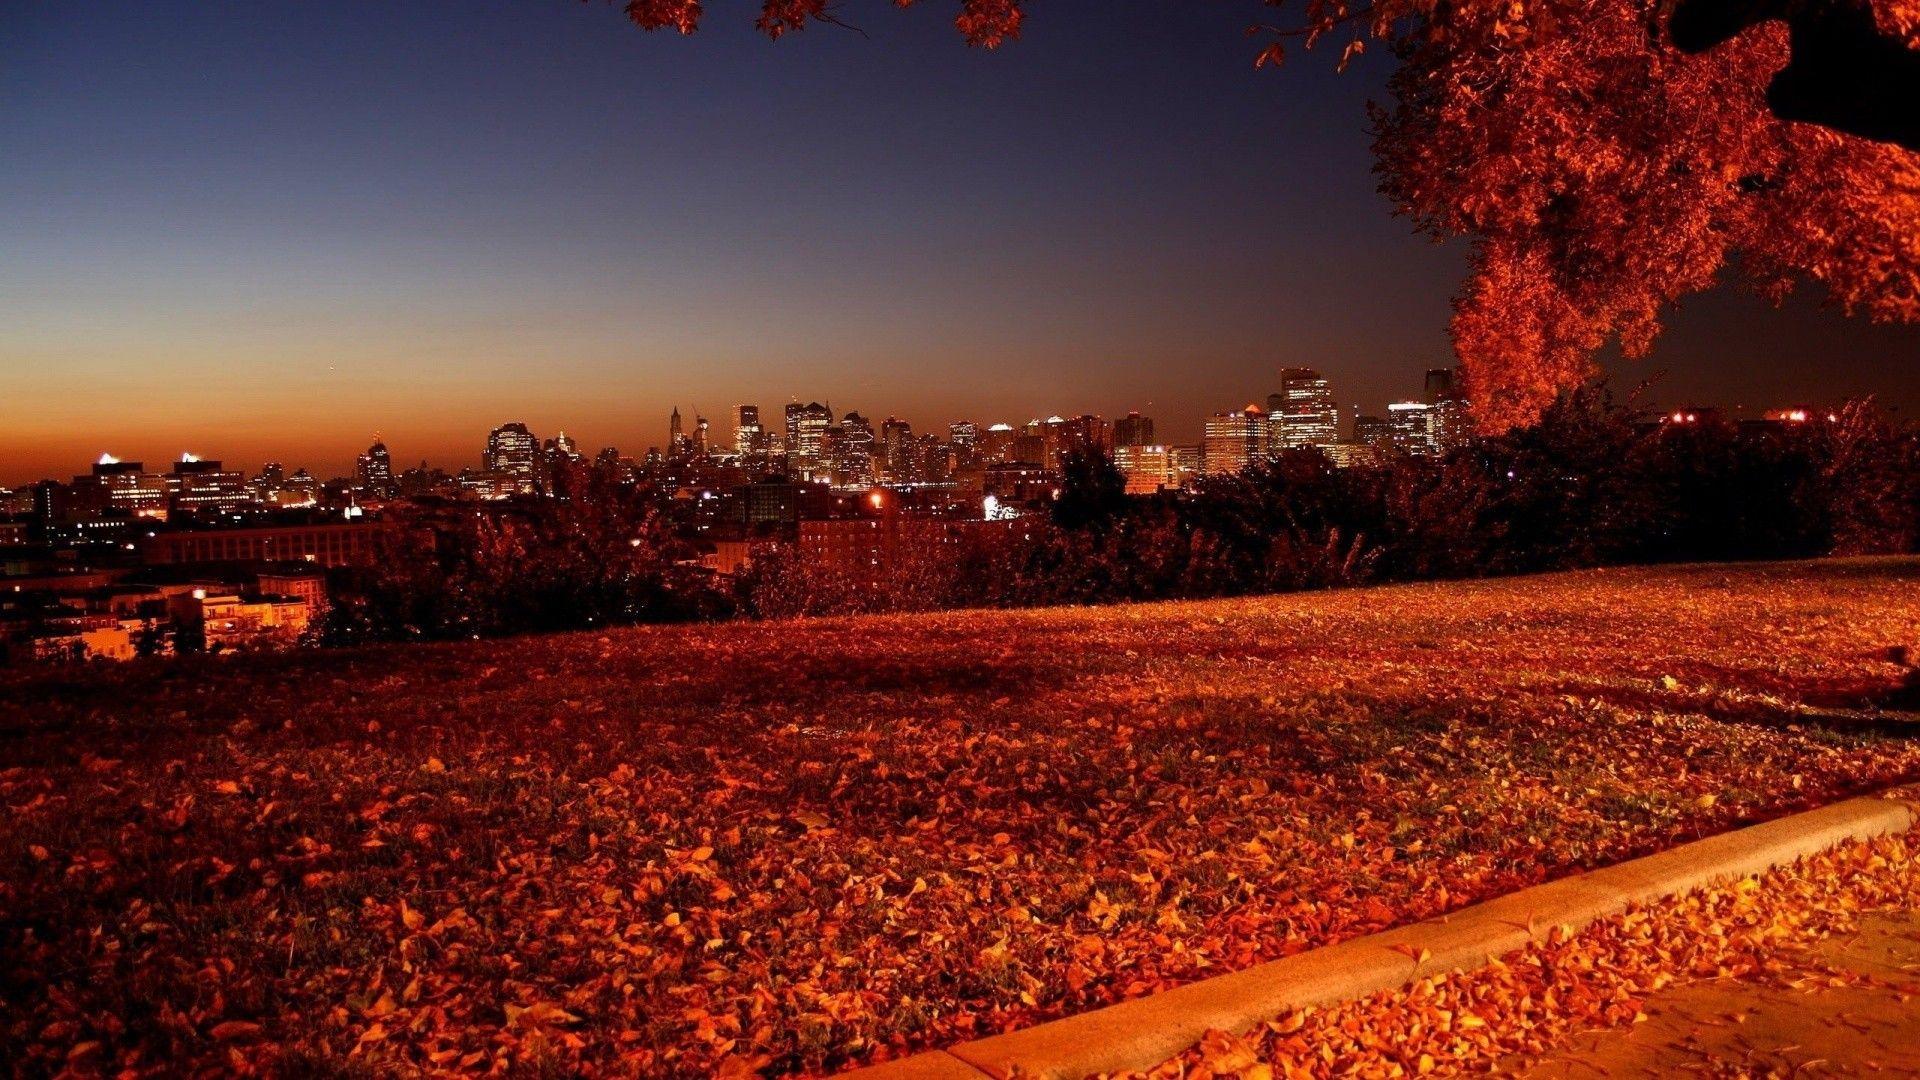 Autumn night picture wallpaper